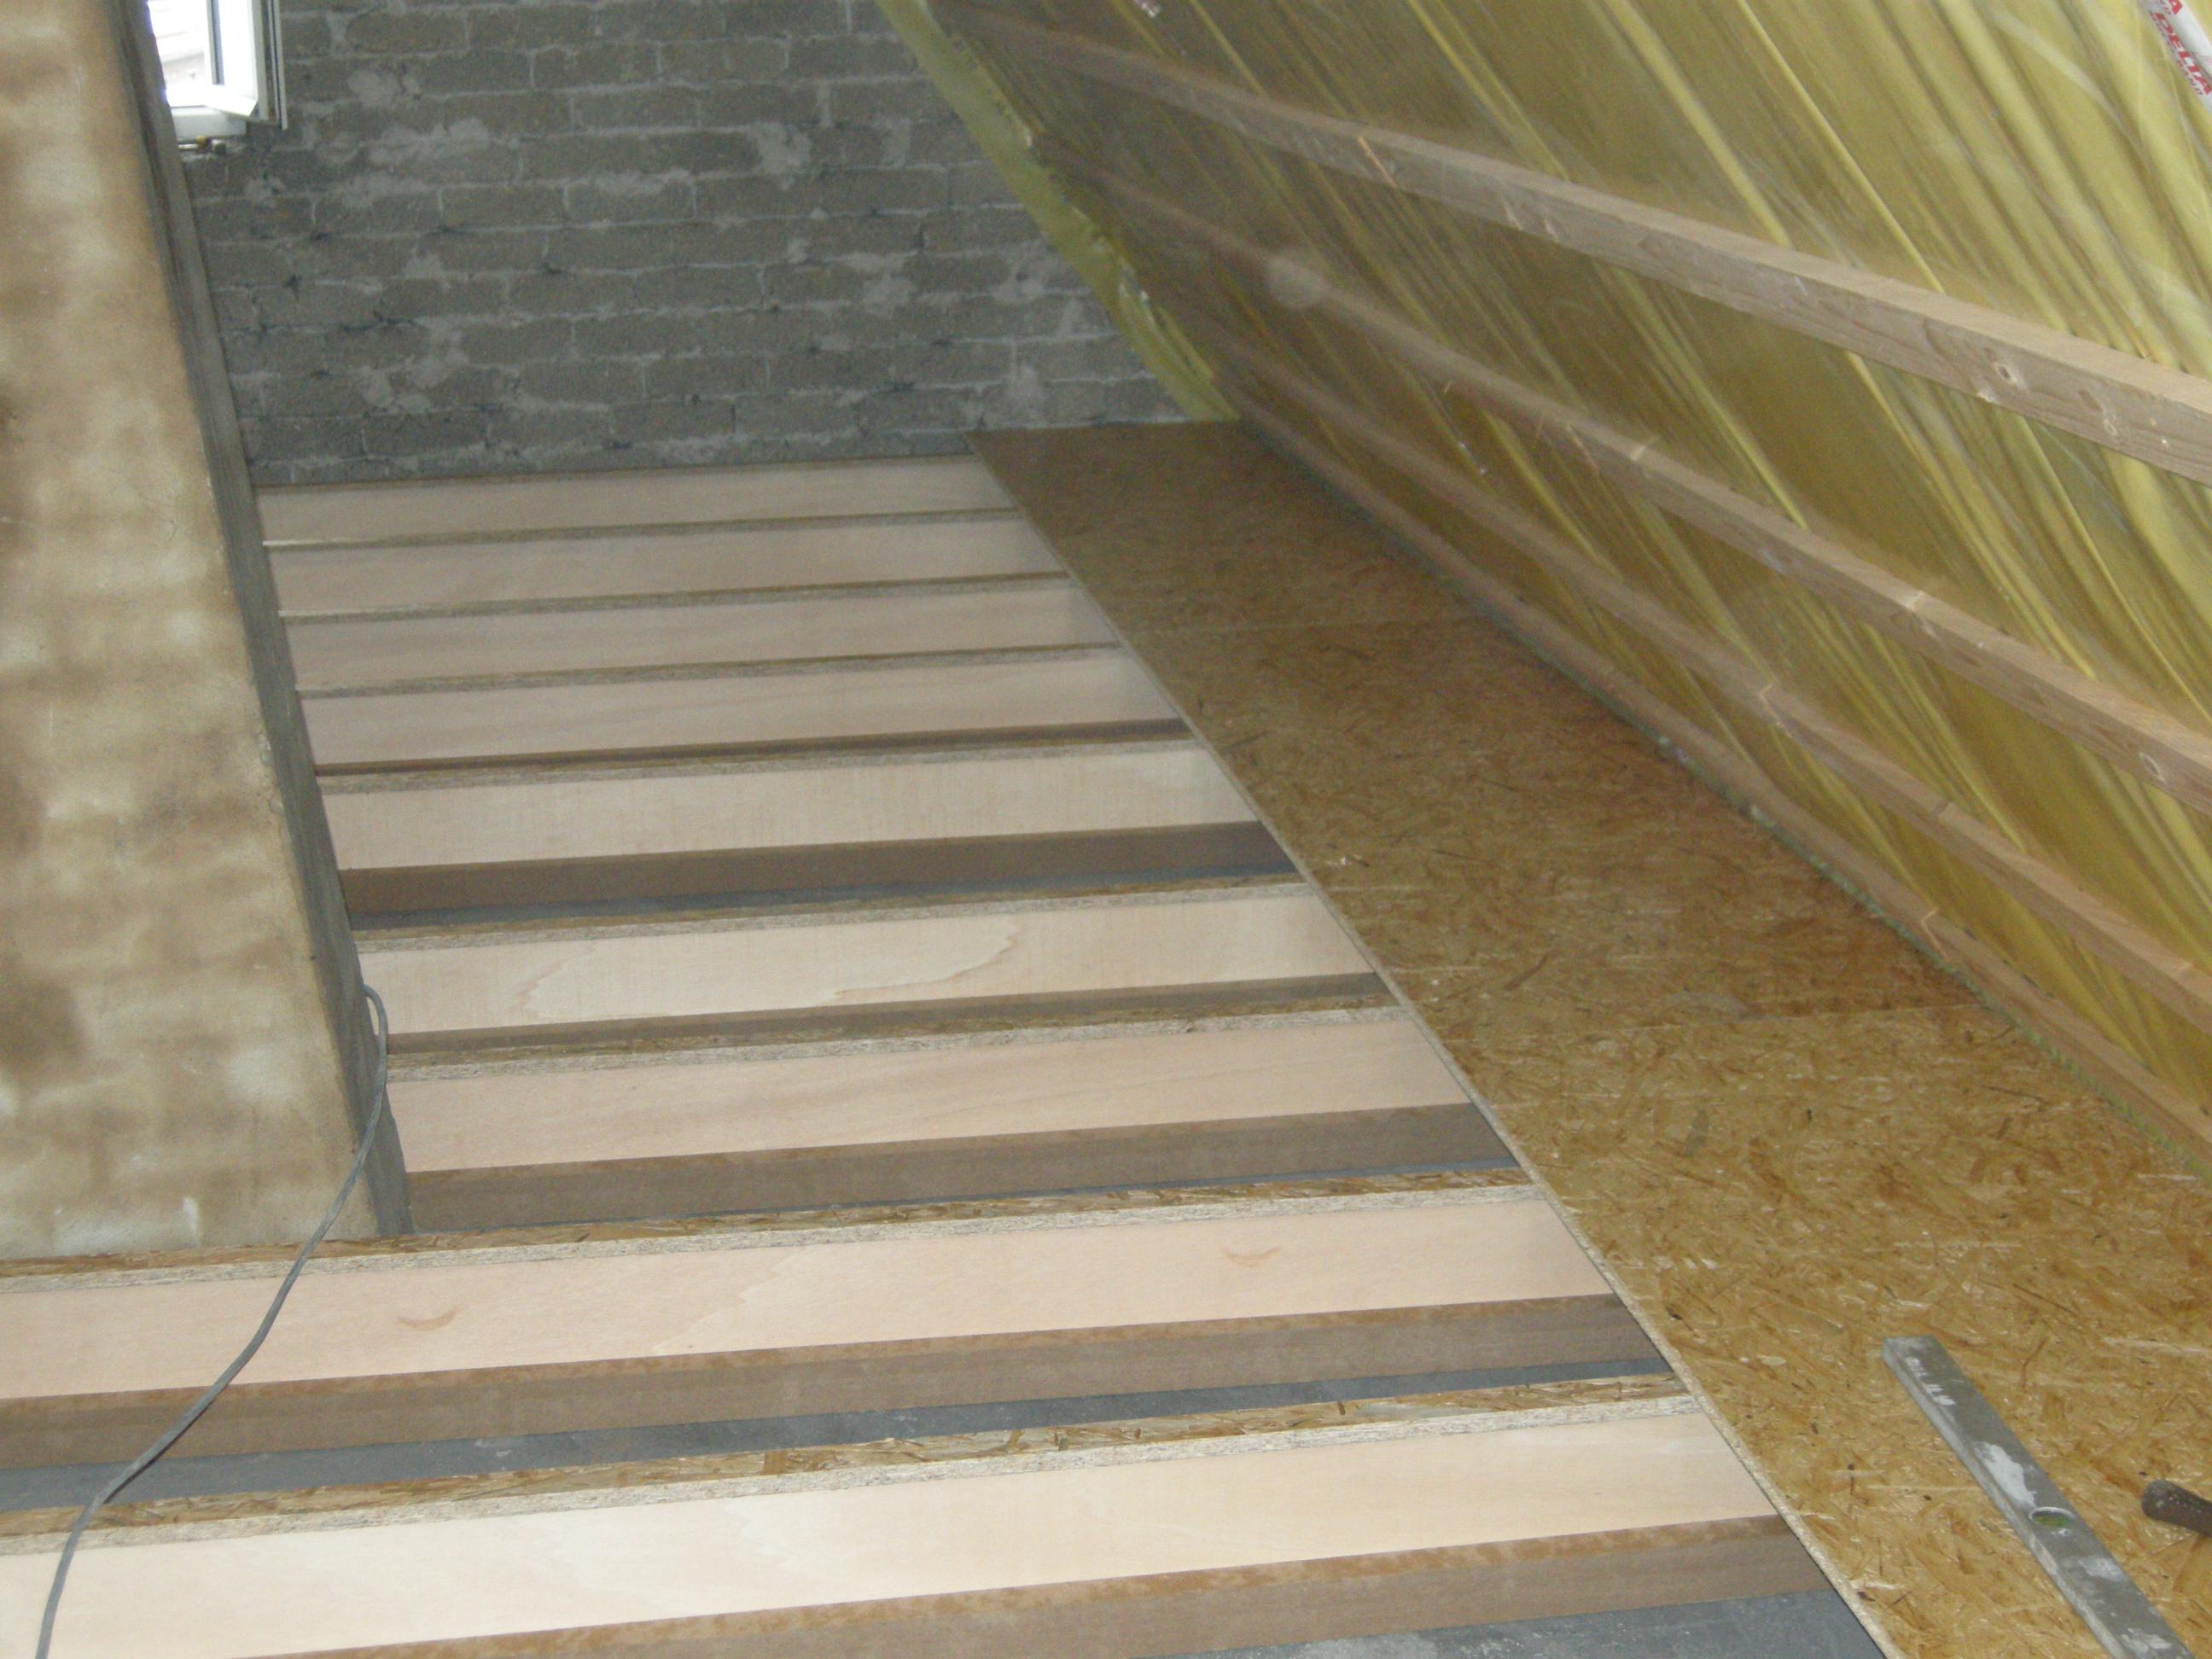 begehbare dachbodendämmung, hölderlinstraße in gelsenkirchen » kasatech